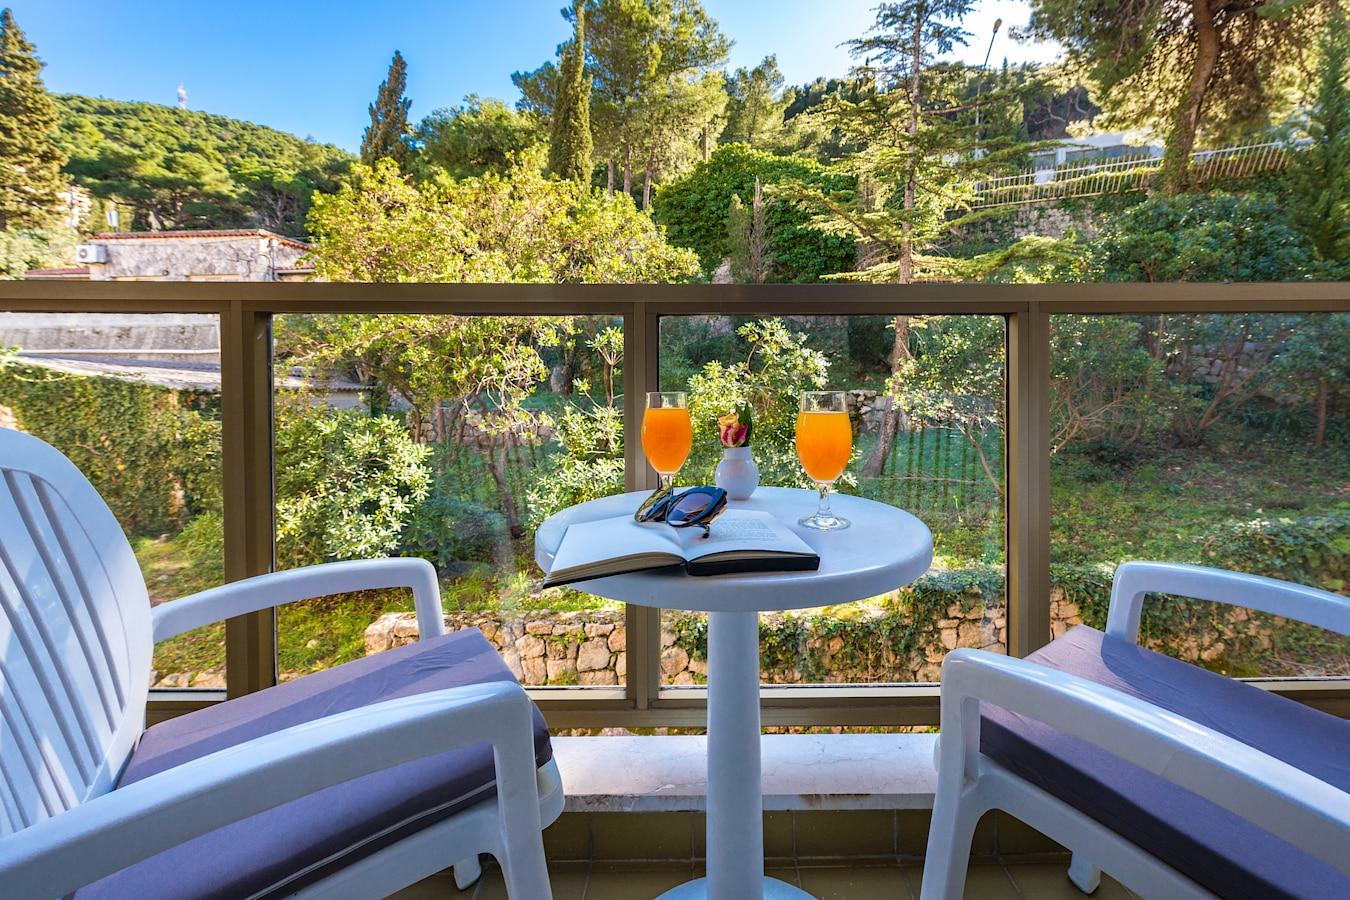 vis-hotel-dubrovnik-room-balcony-park-view.jpg